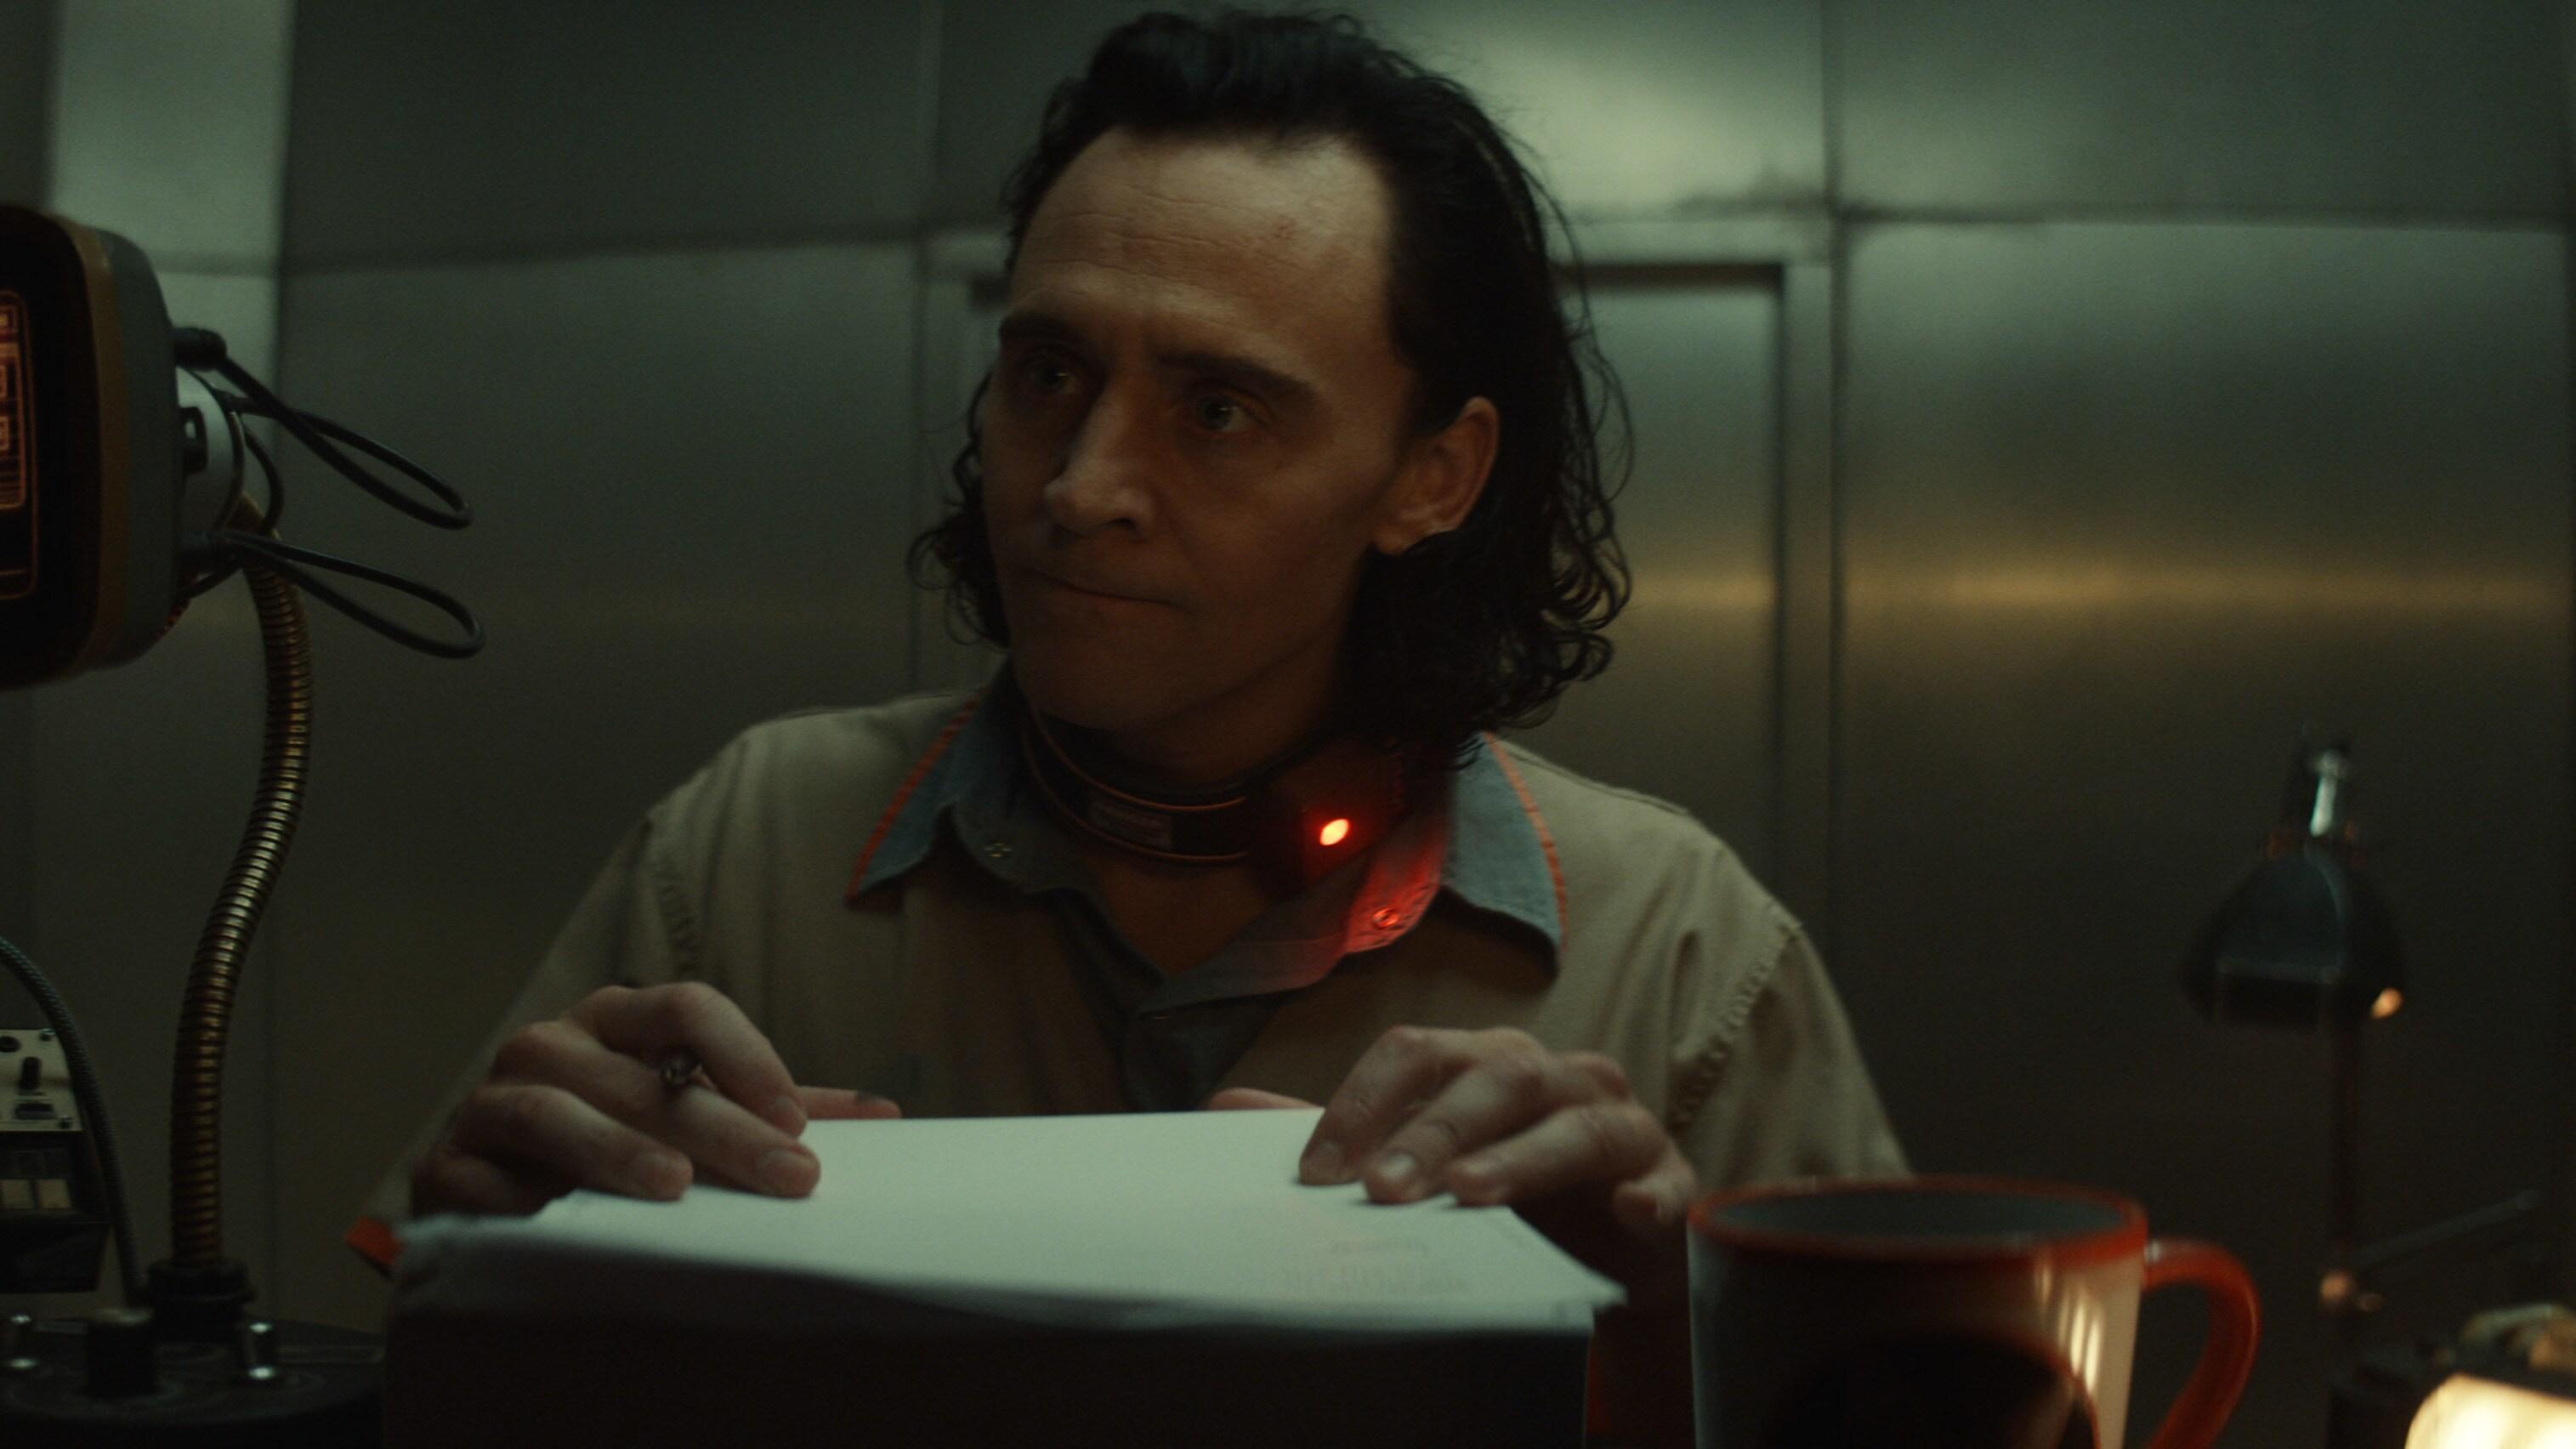 Loki (TomHiddleston) in Marvel Studios' LOKI, exclusively on Disney+. Photo courtesy of Marvel Studios. ©Marvel Studios 2021. All Rights Reserved.